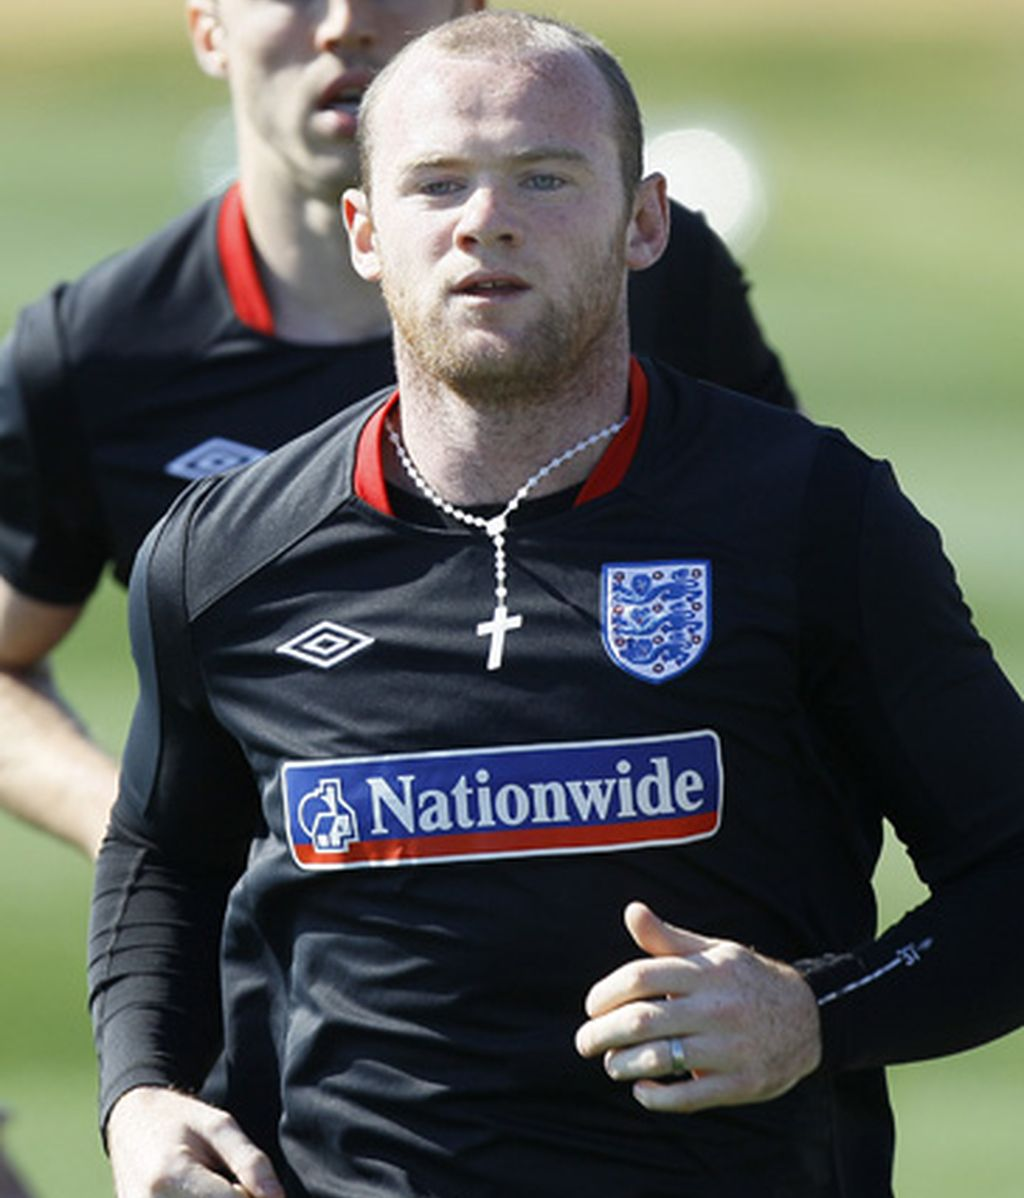 1. Wayne Rooney (Inglaterra)